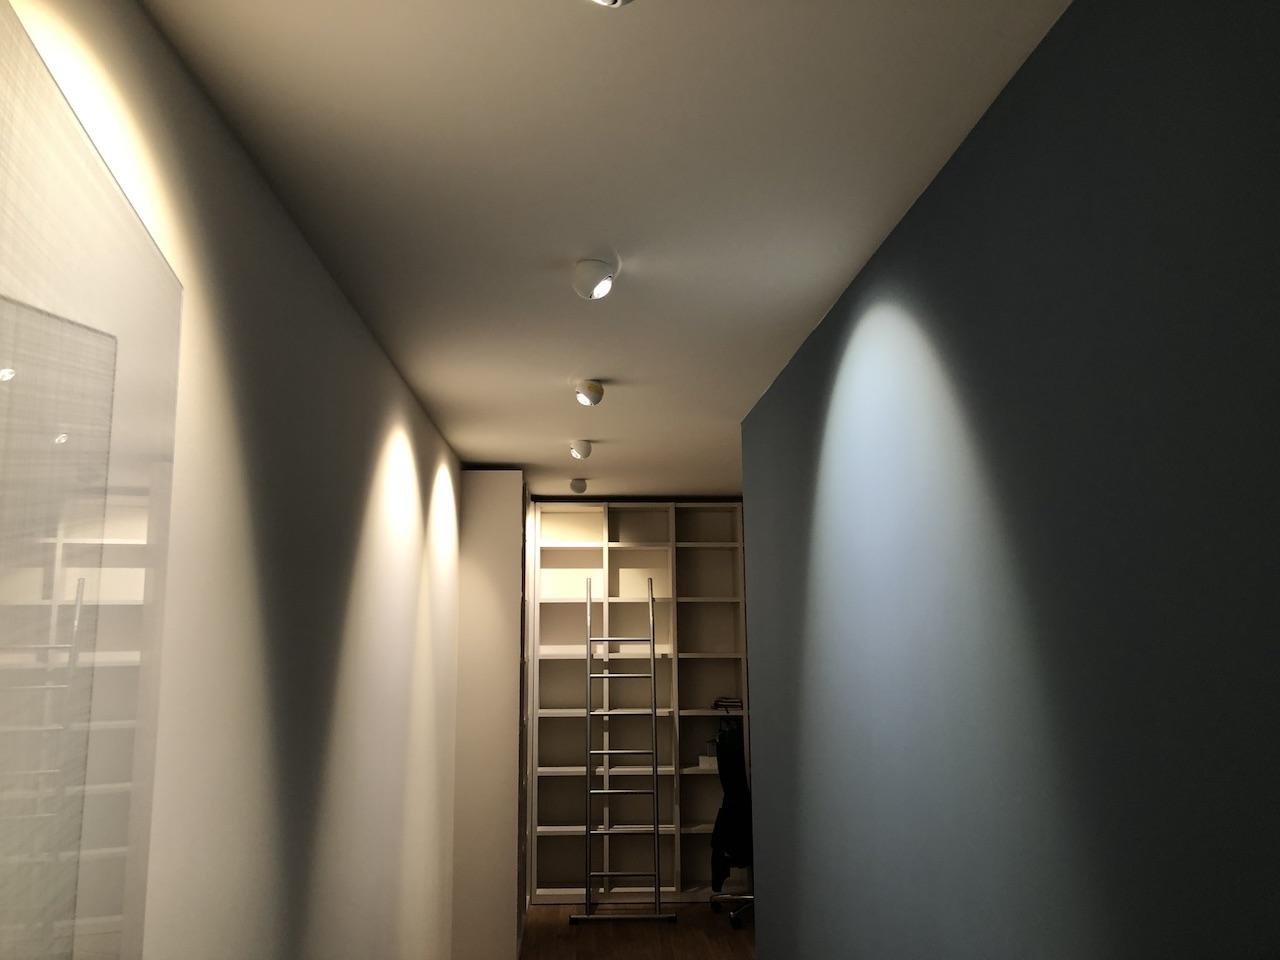 Lichtplanung – Profi-Tipps